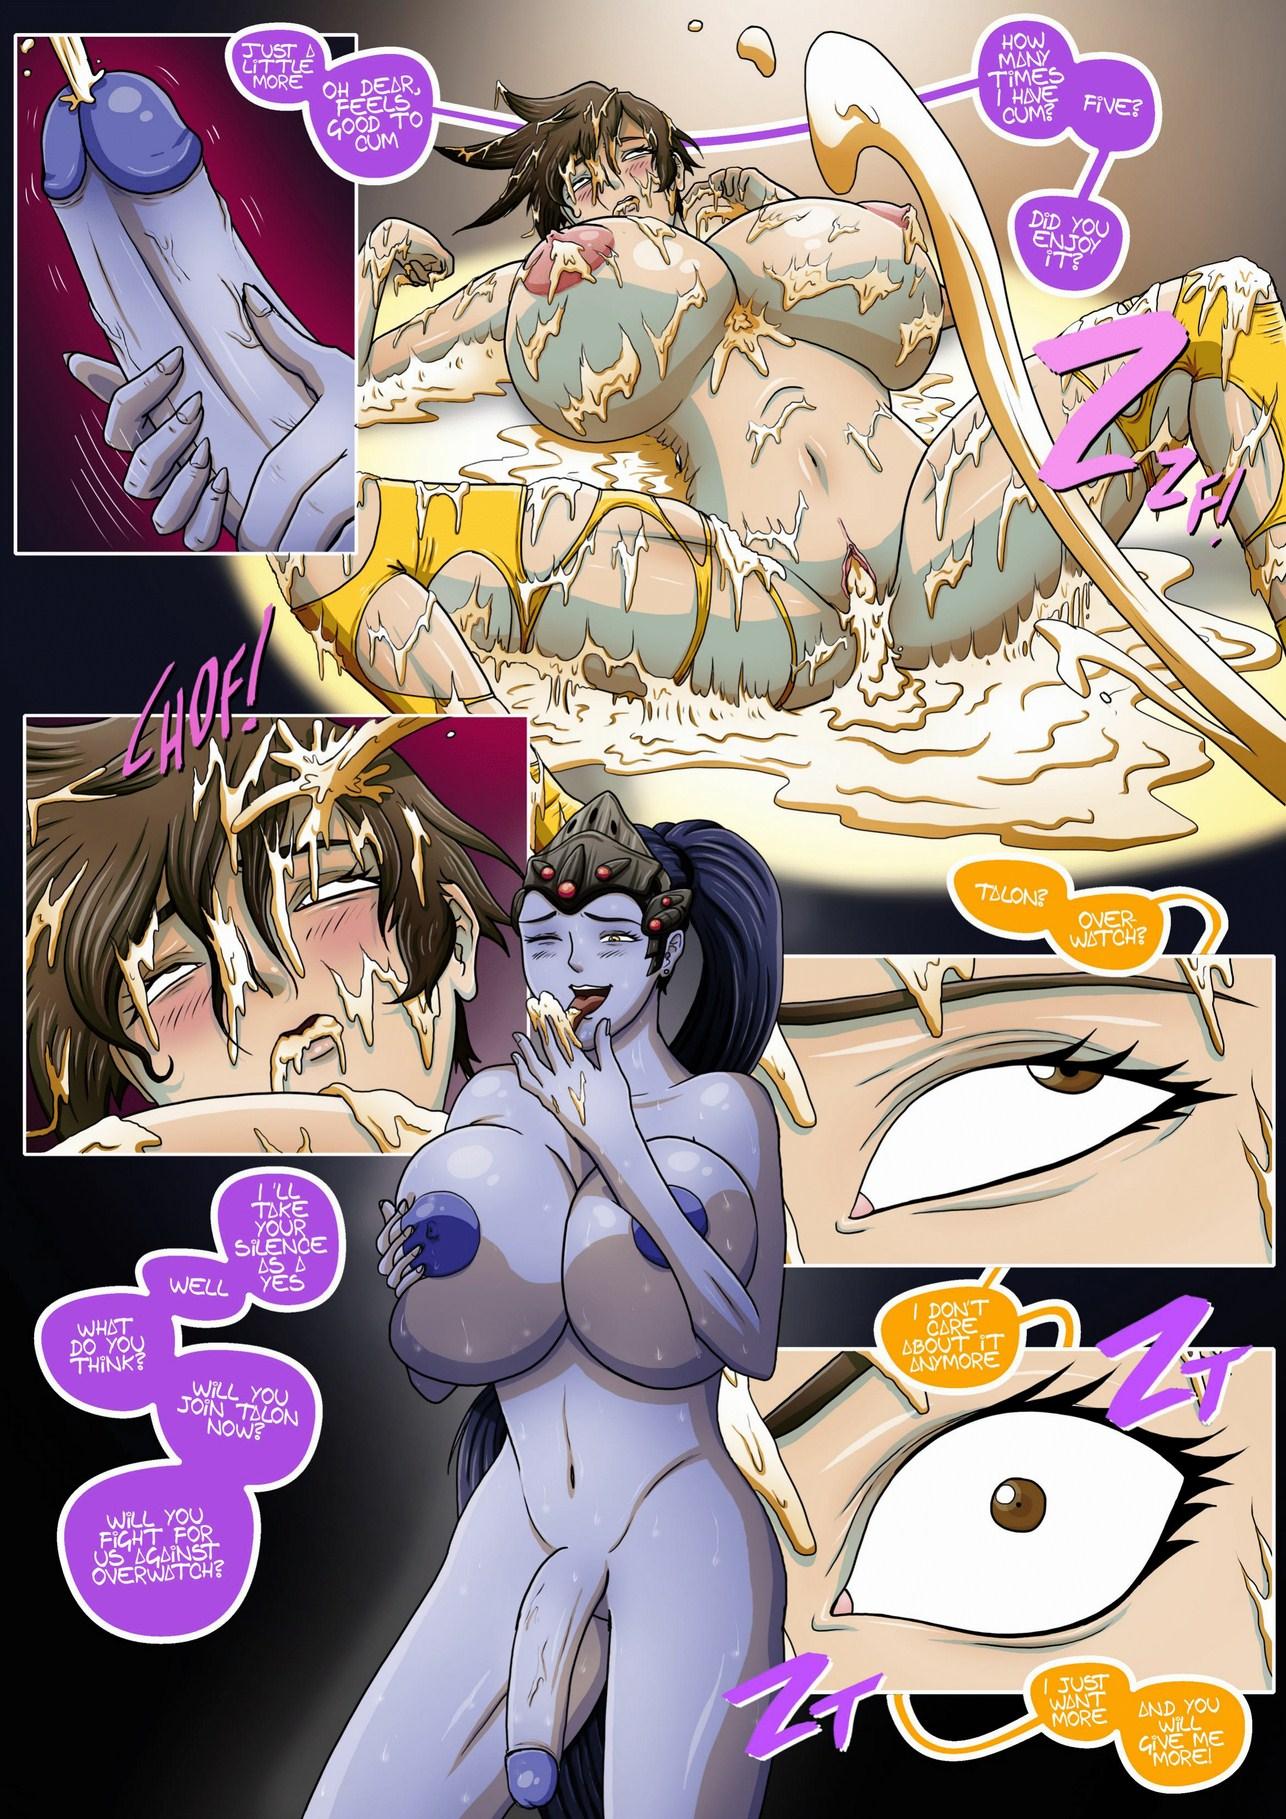 Anime porn unblurred